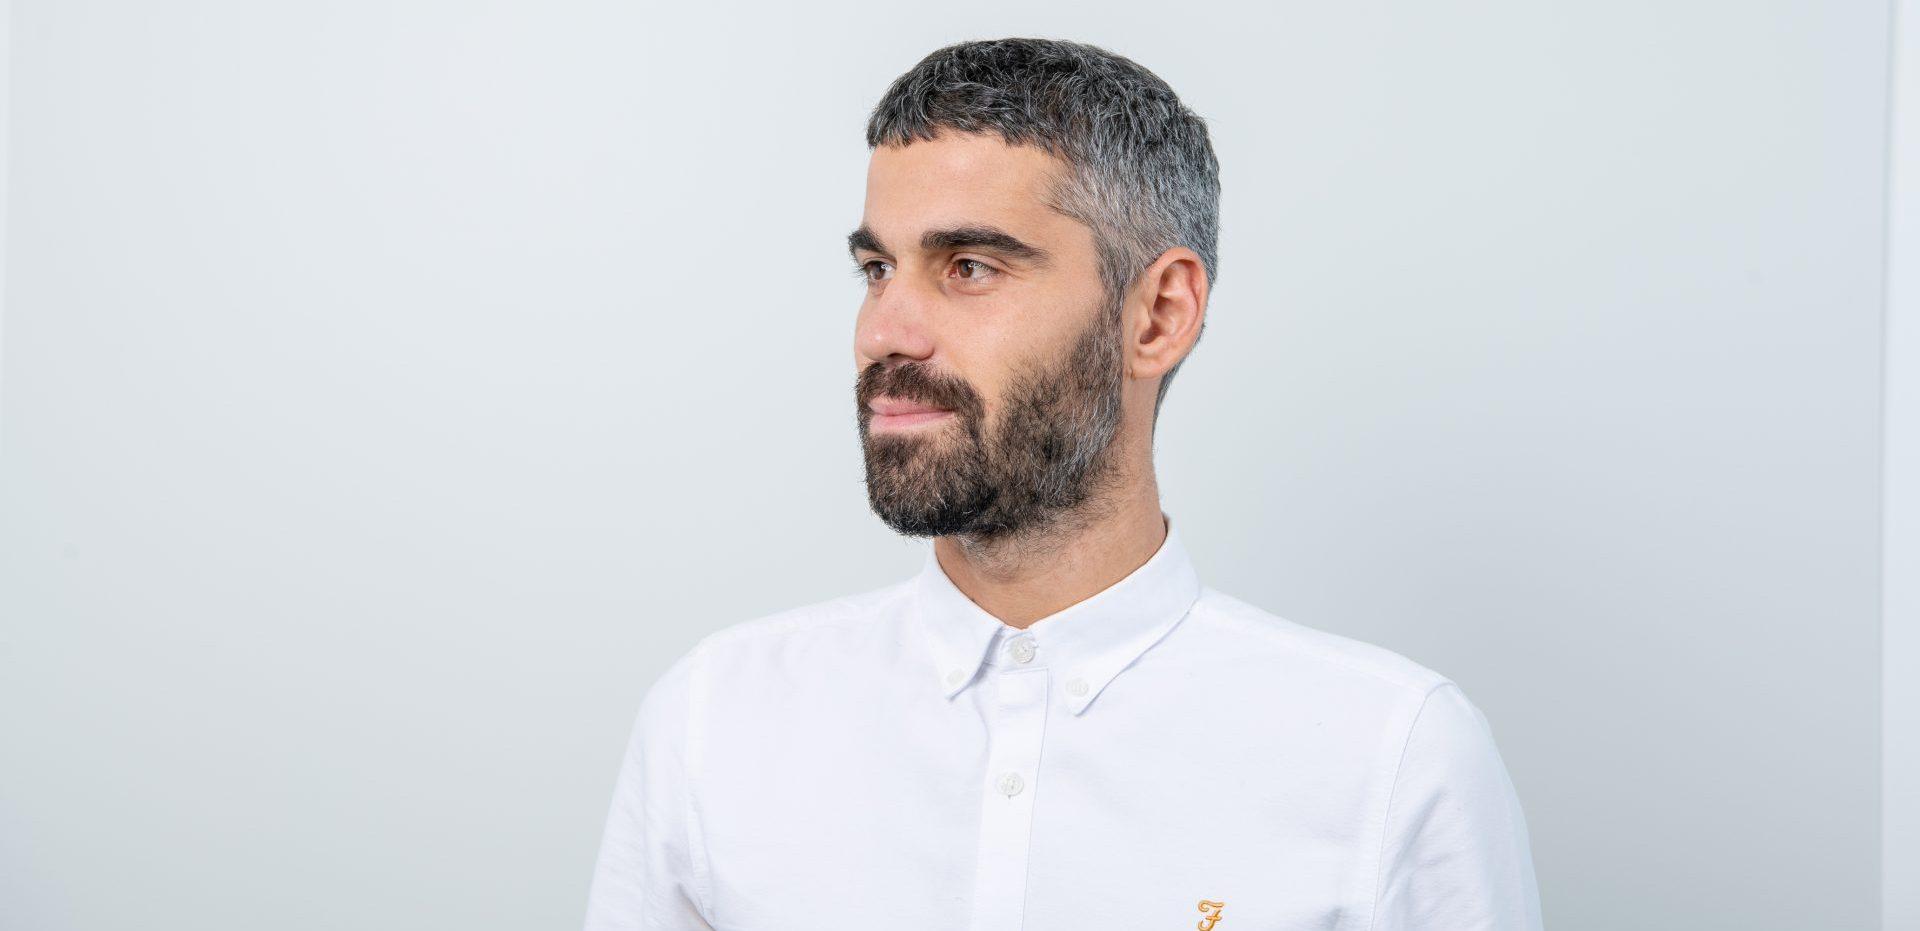 Alessandro Chiola on Boundaries